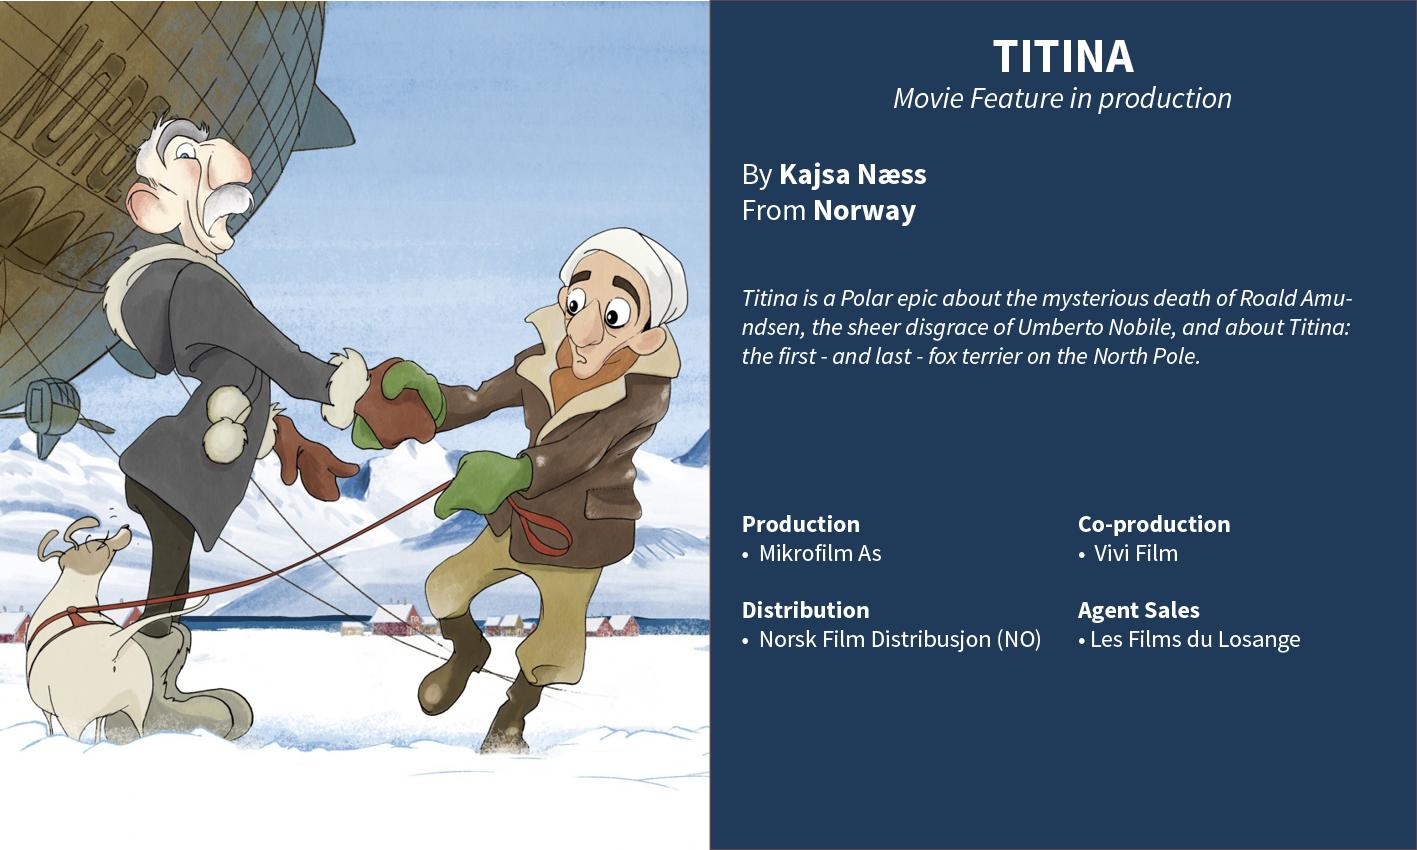 Titina, Kajsa Naess